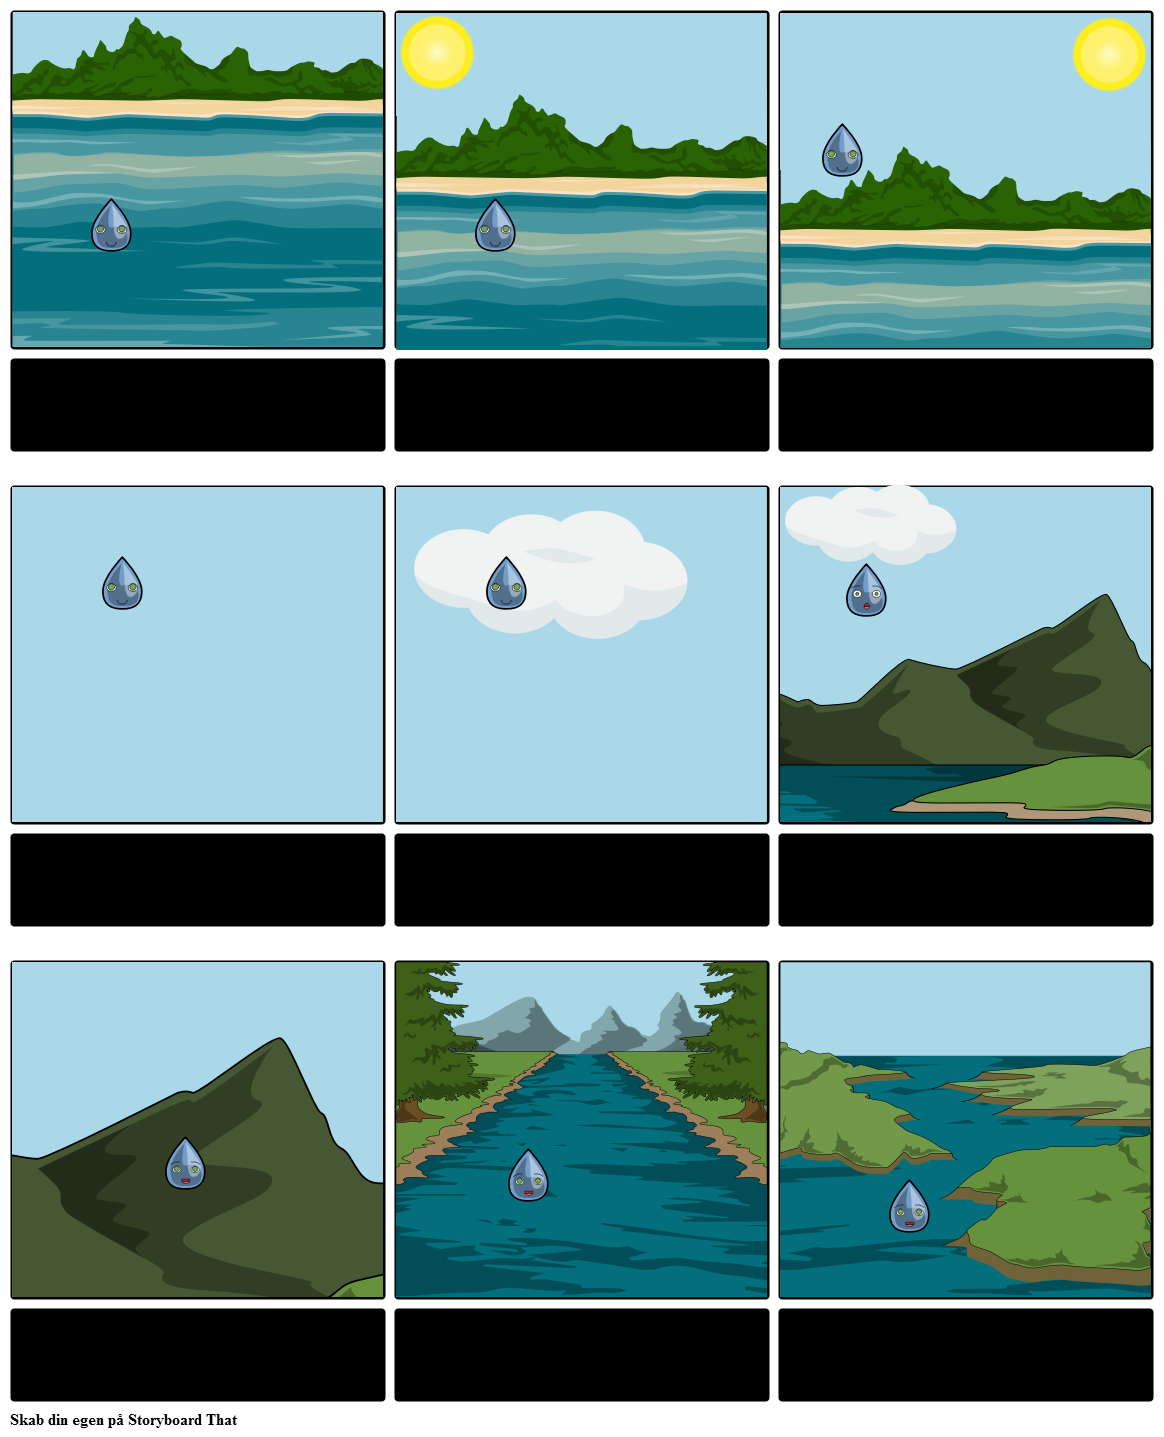 Vandcyklusfortælling